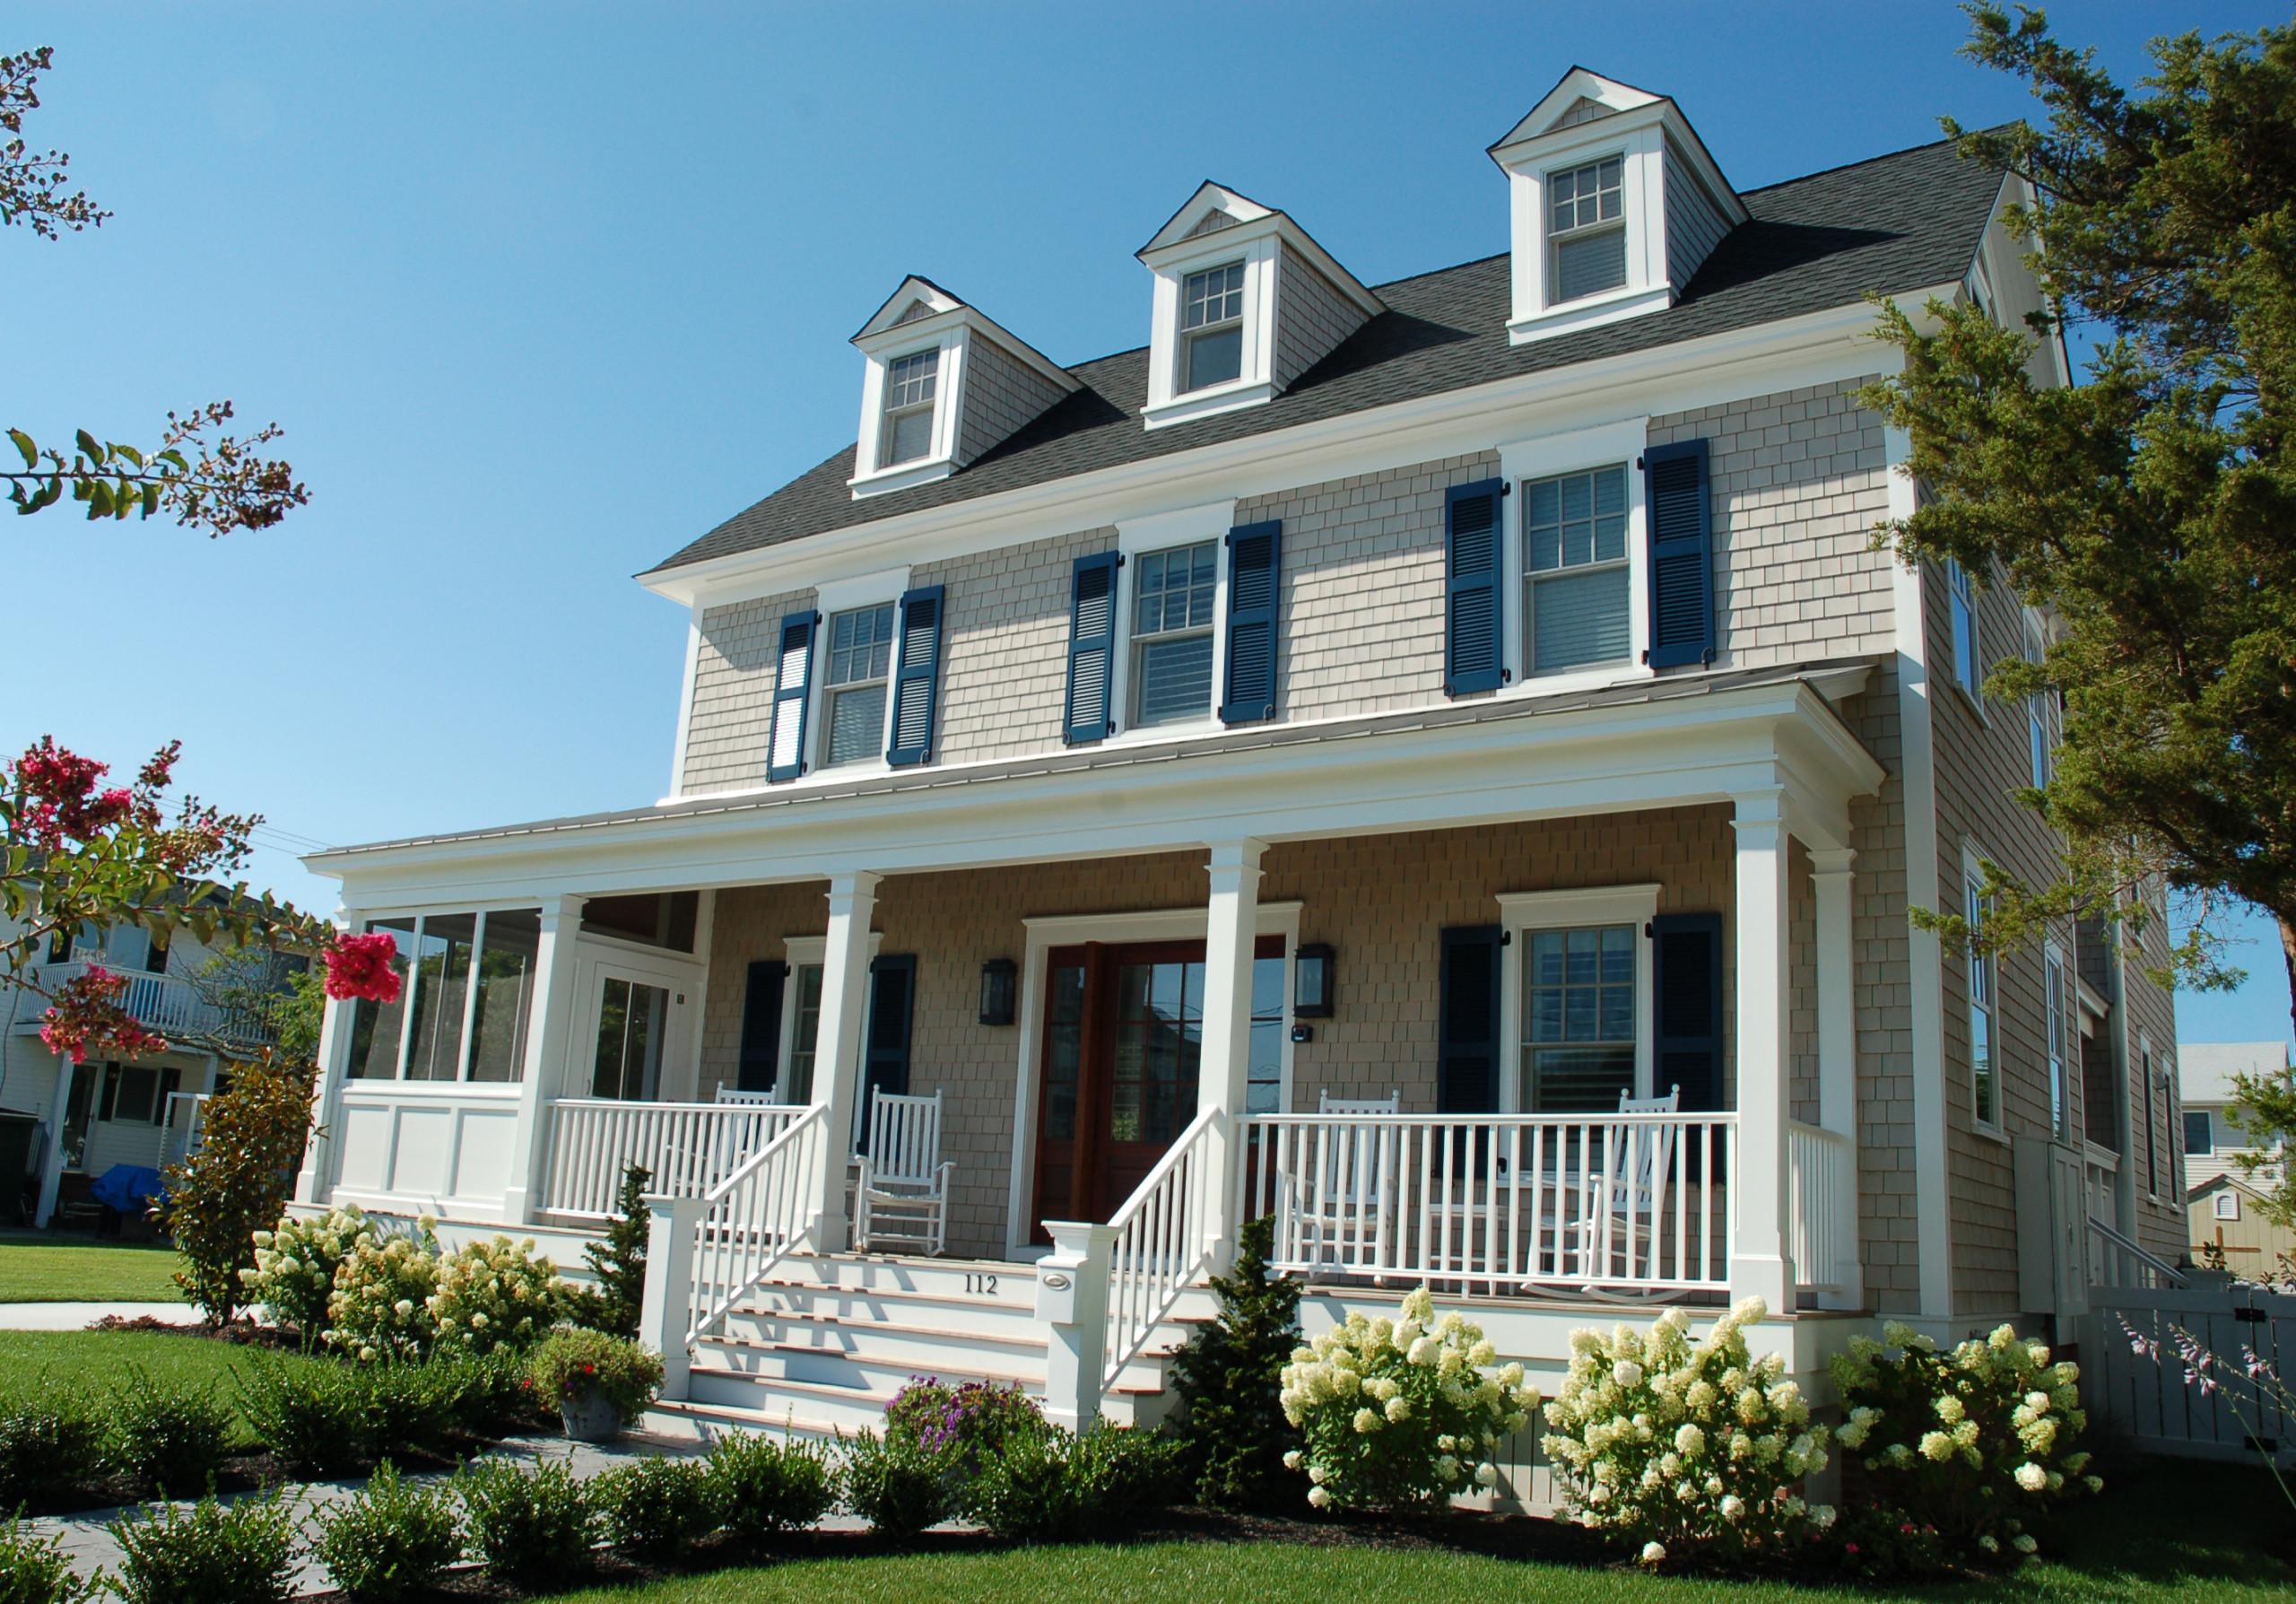 Shingle Style Colonial in Avalon, NJ